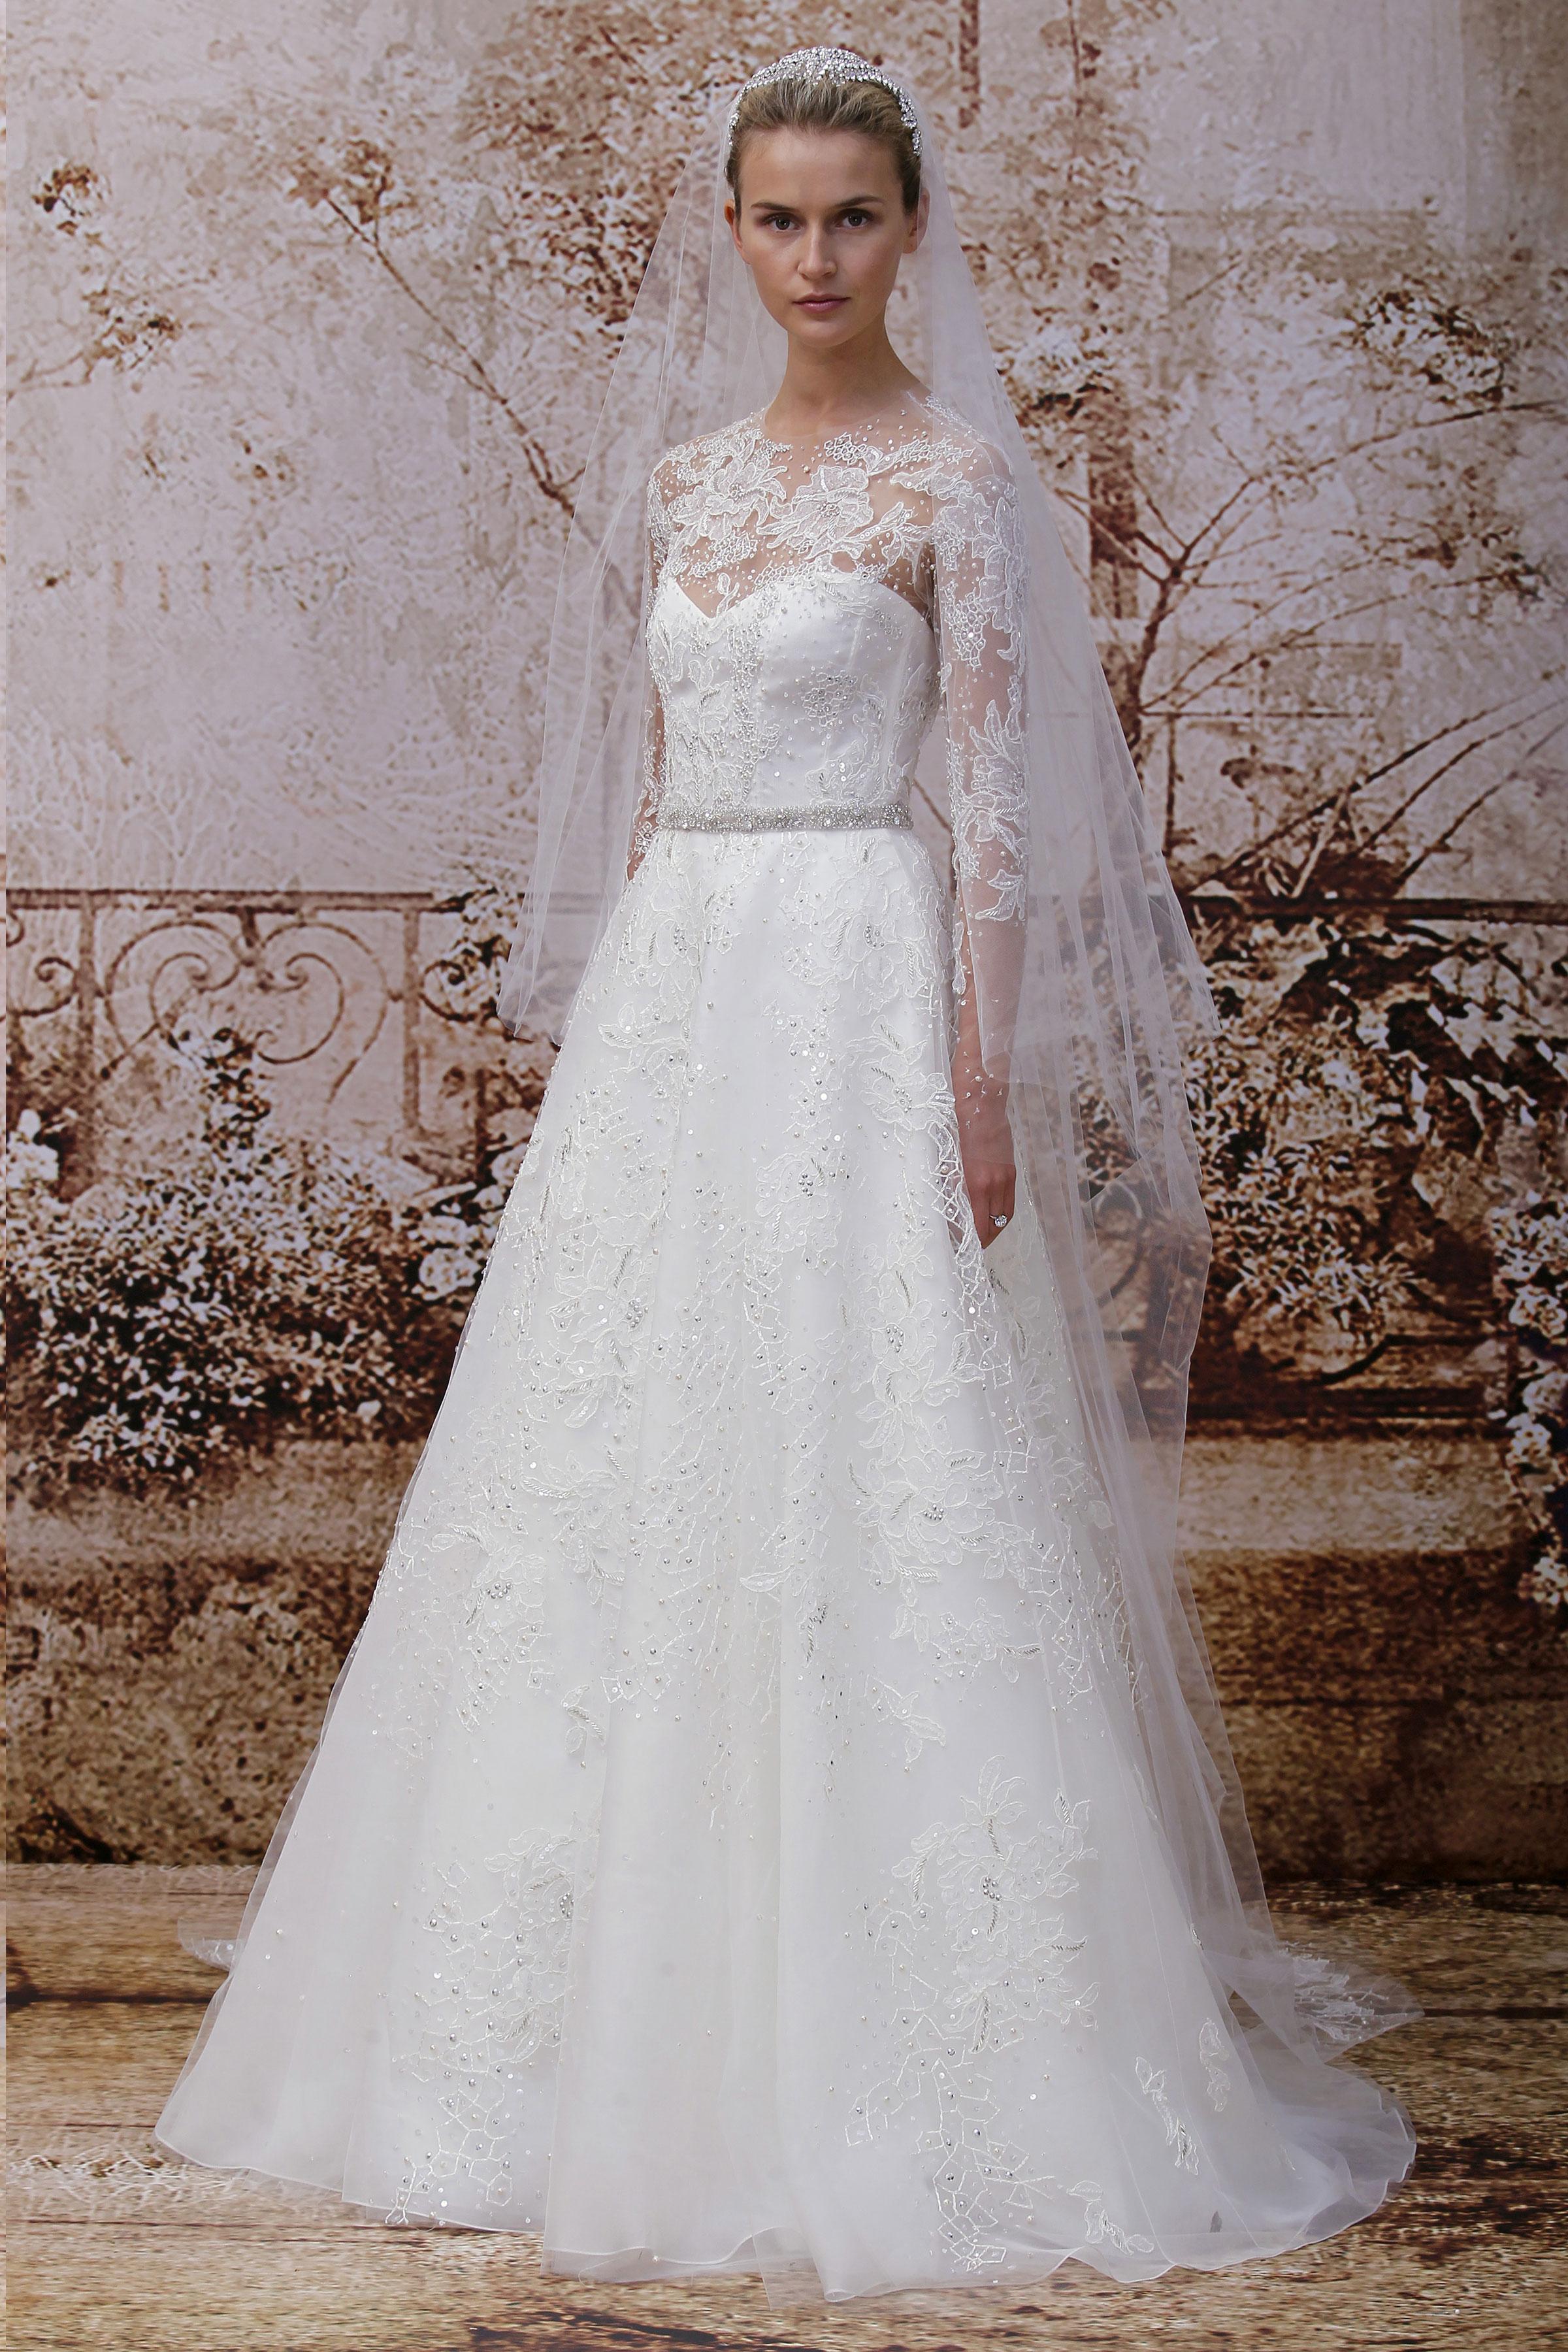 17 Best images about Wedding Dresses on Pinterest | Dress wedding ...